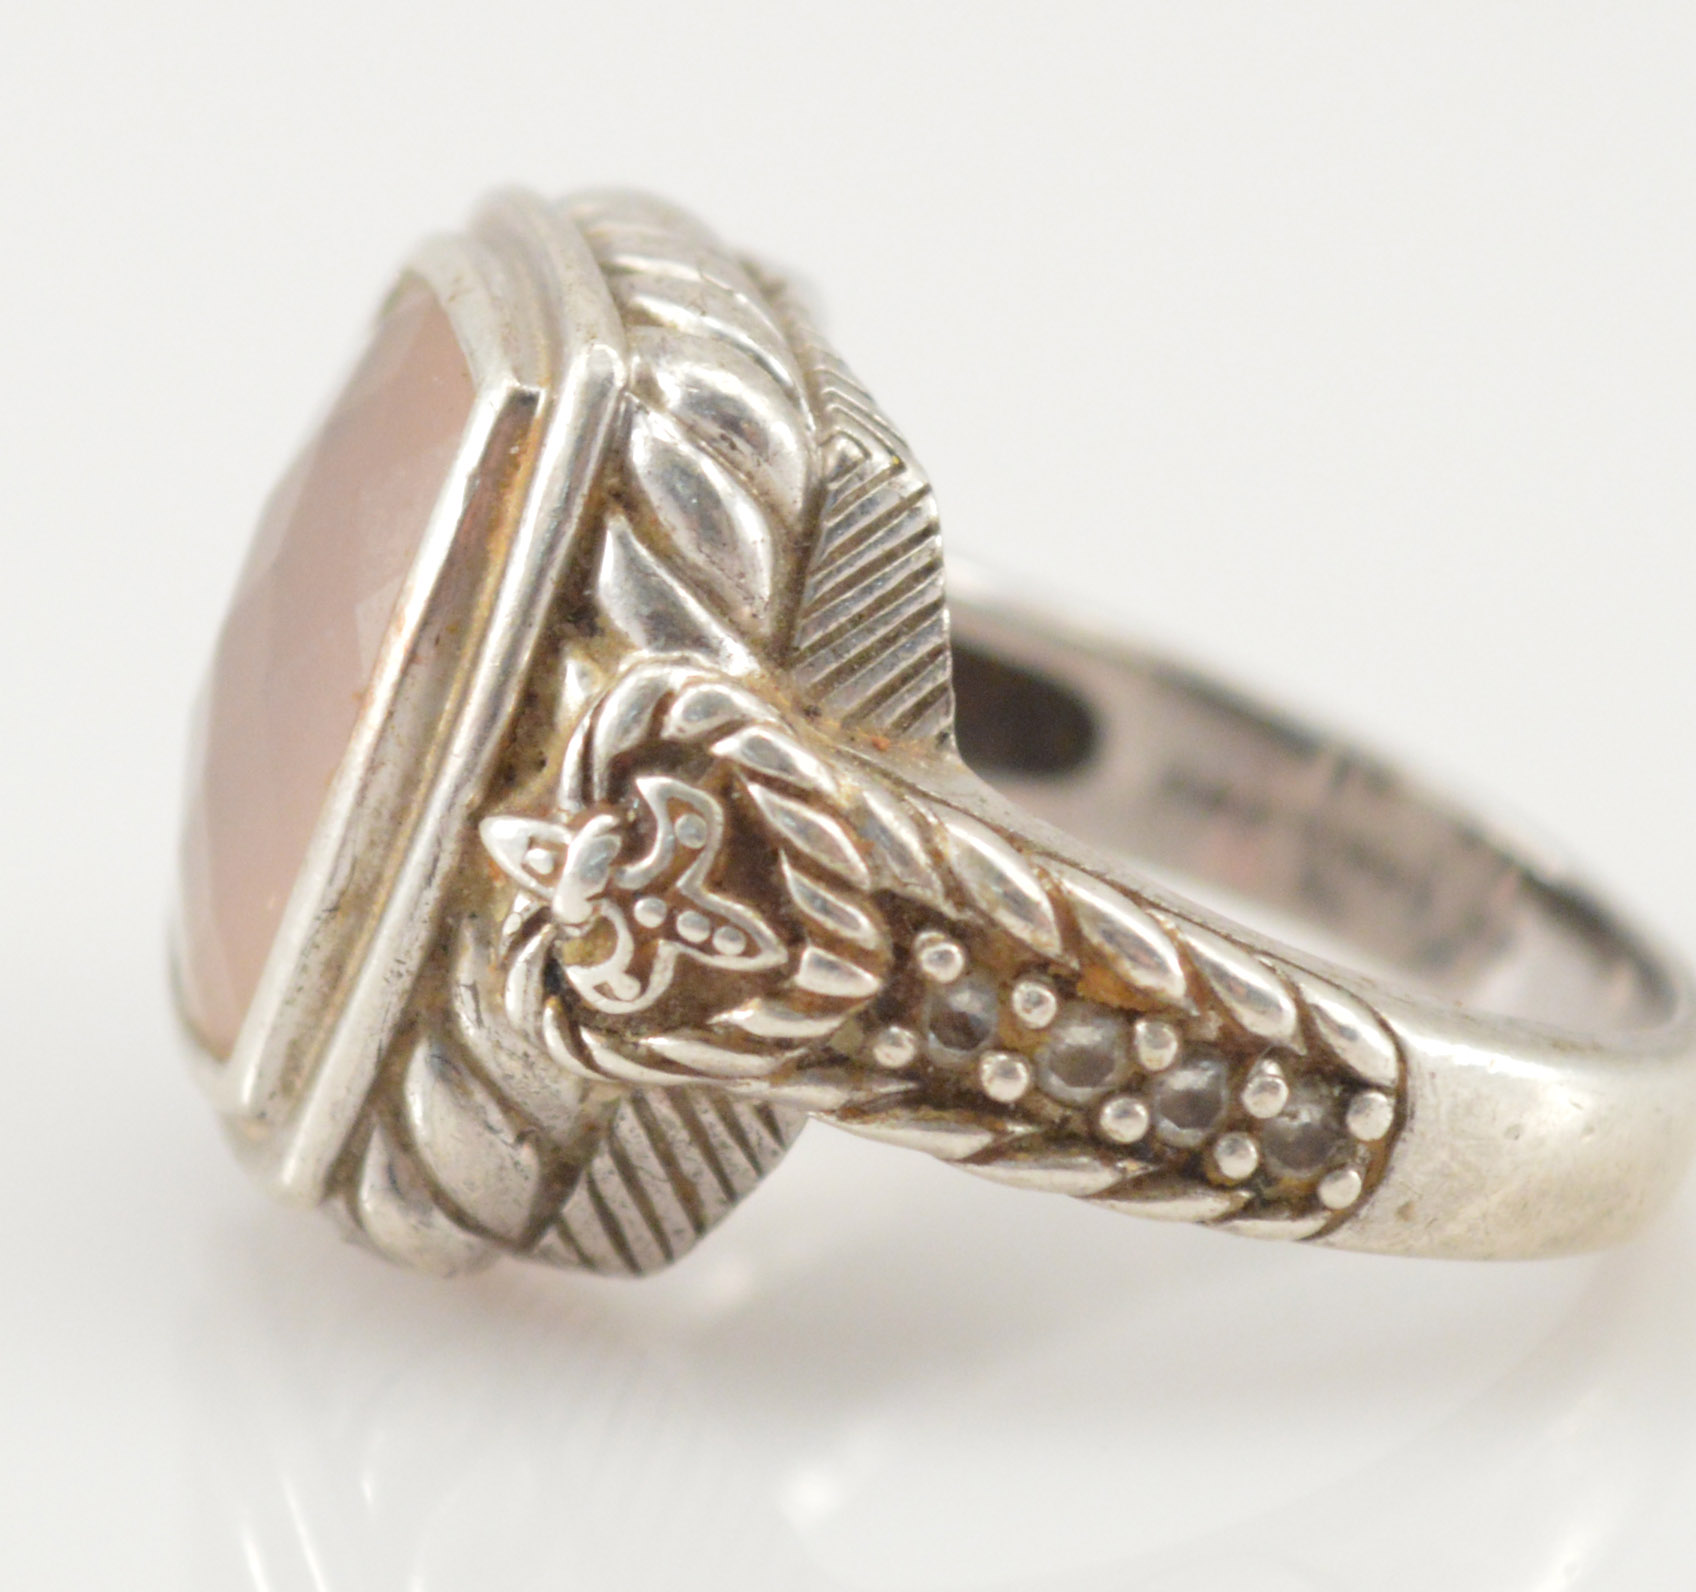 11 6g Solid Silver Retail $285 Judith Ripka Bezel Set Faceted Rose